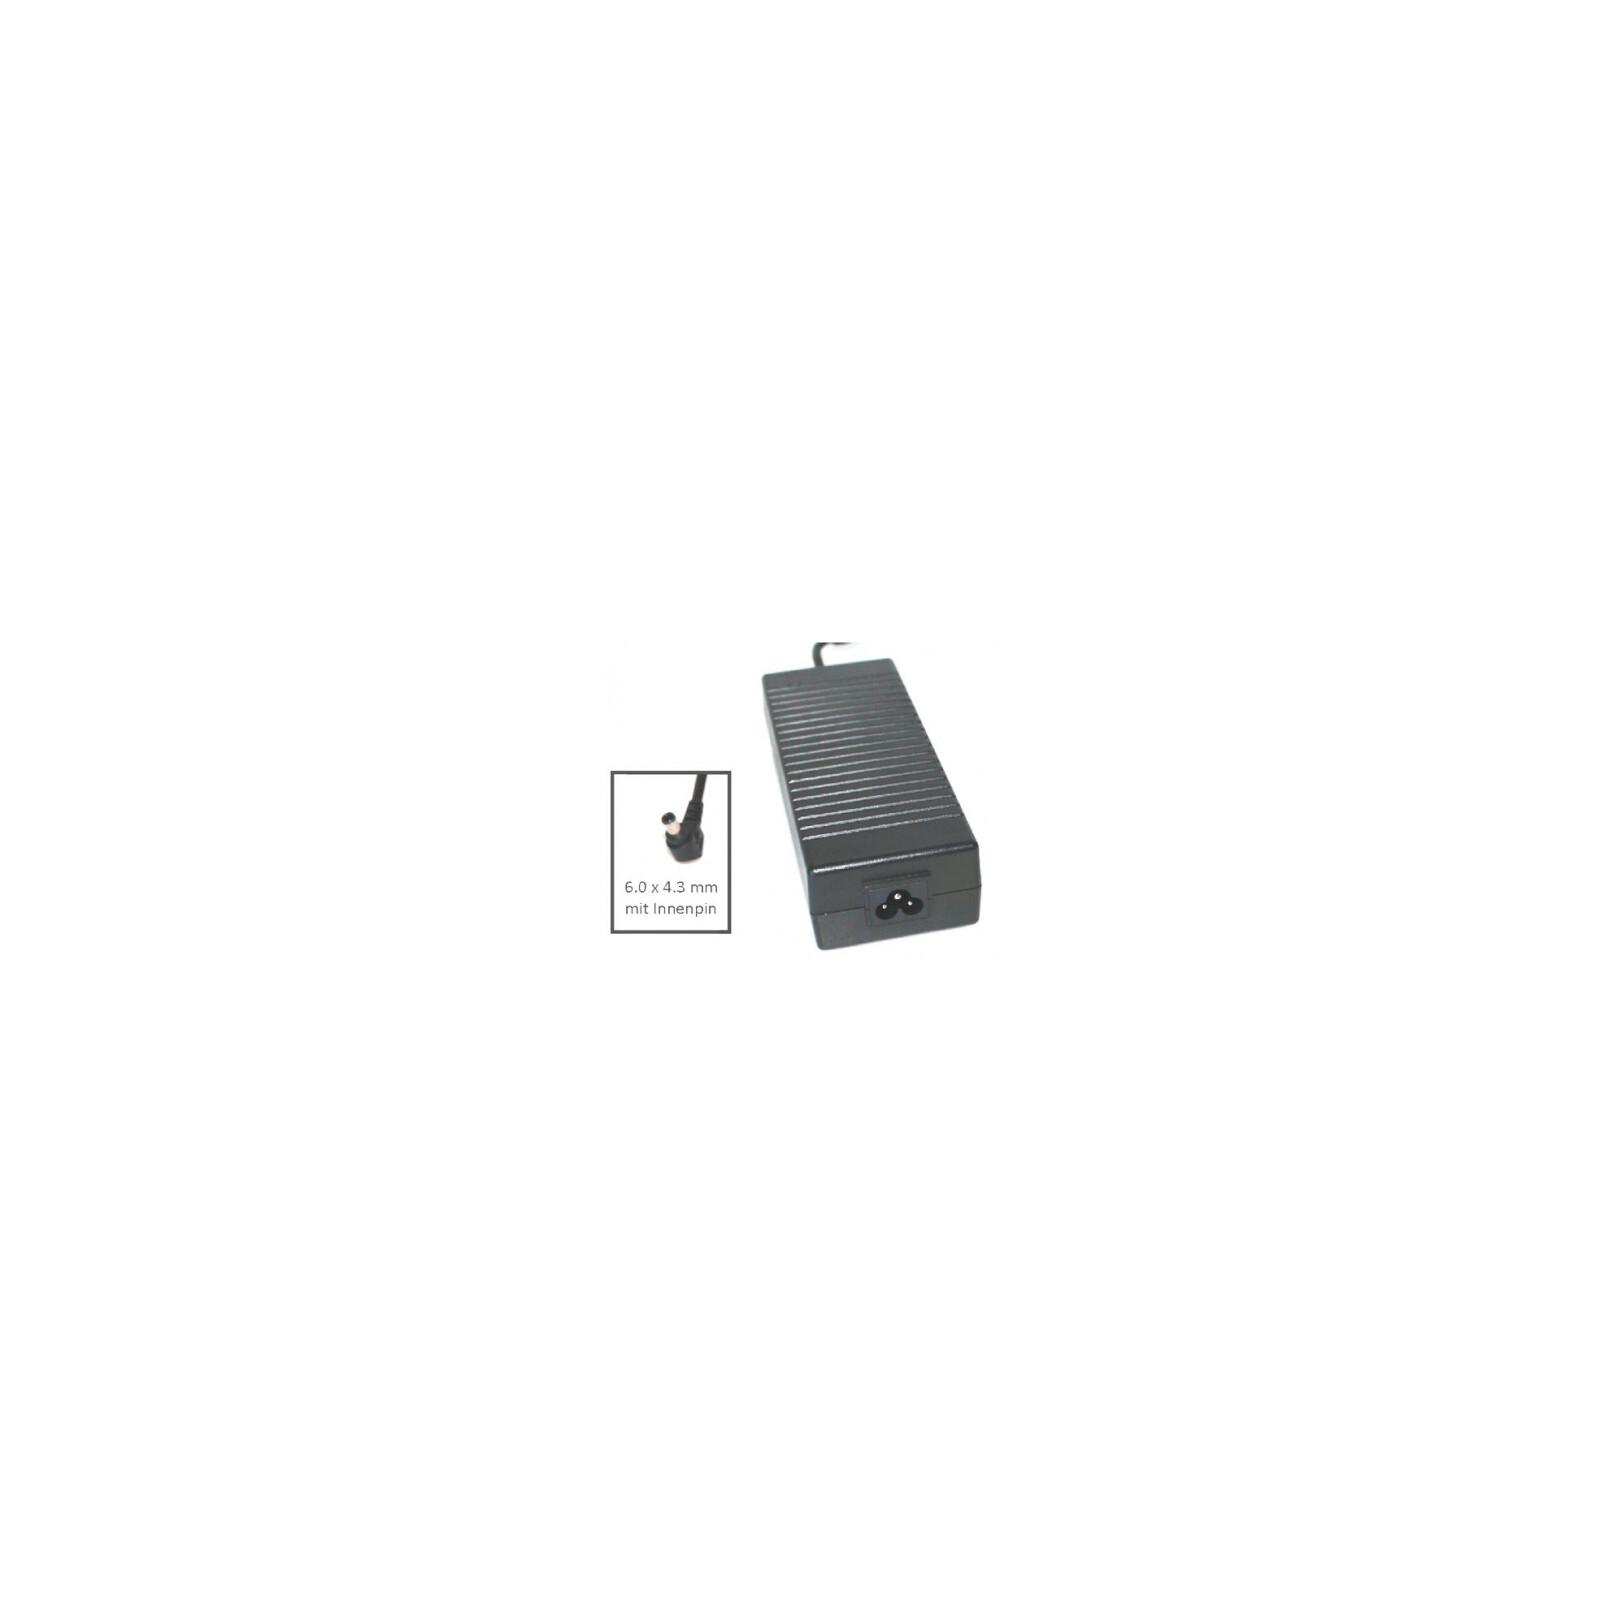 AGI Netzteil Sony Vaio VGN-FS115 120W